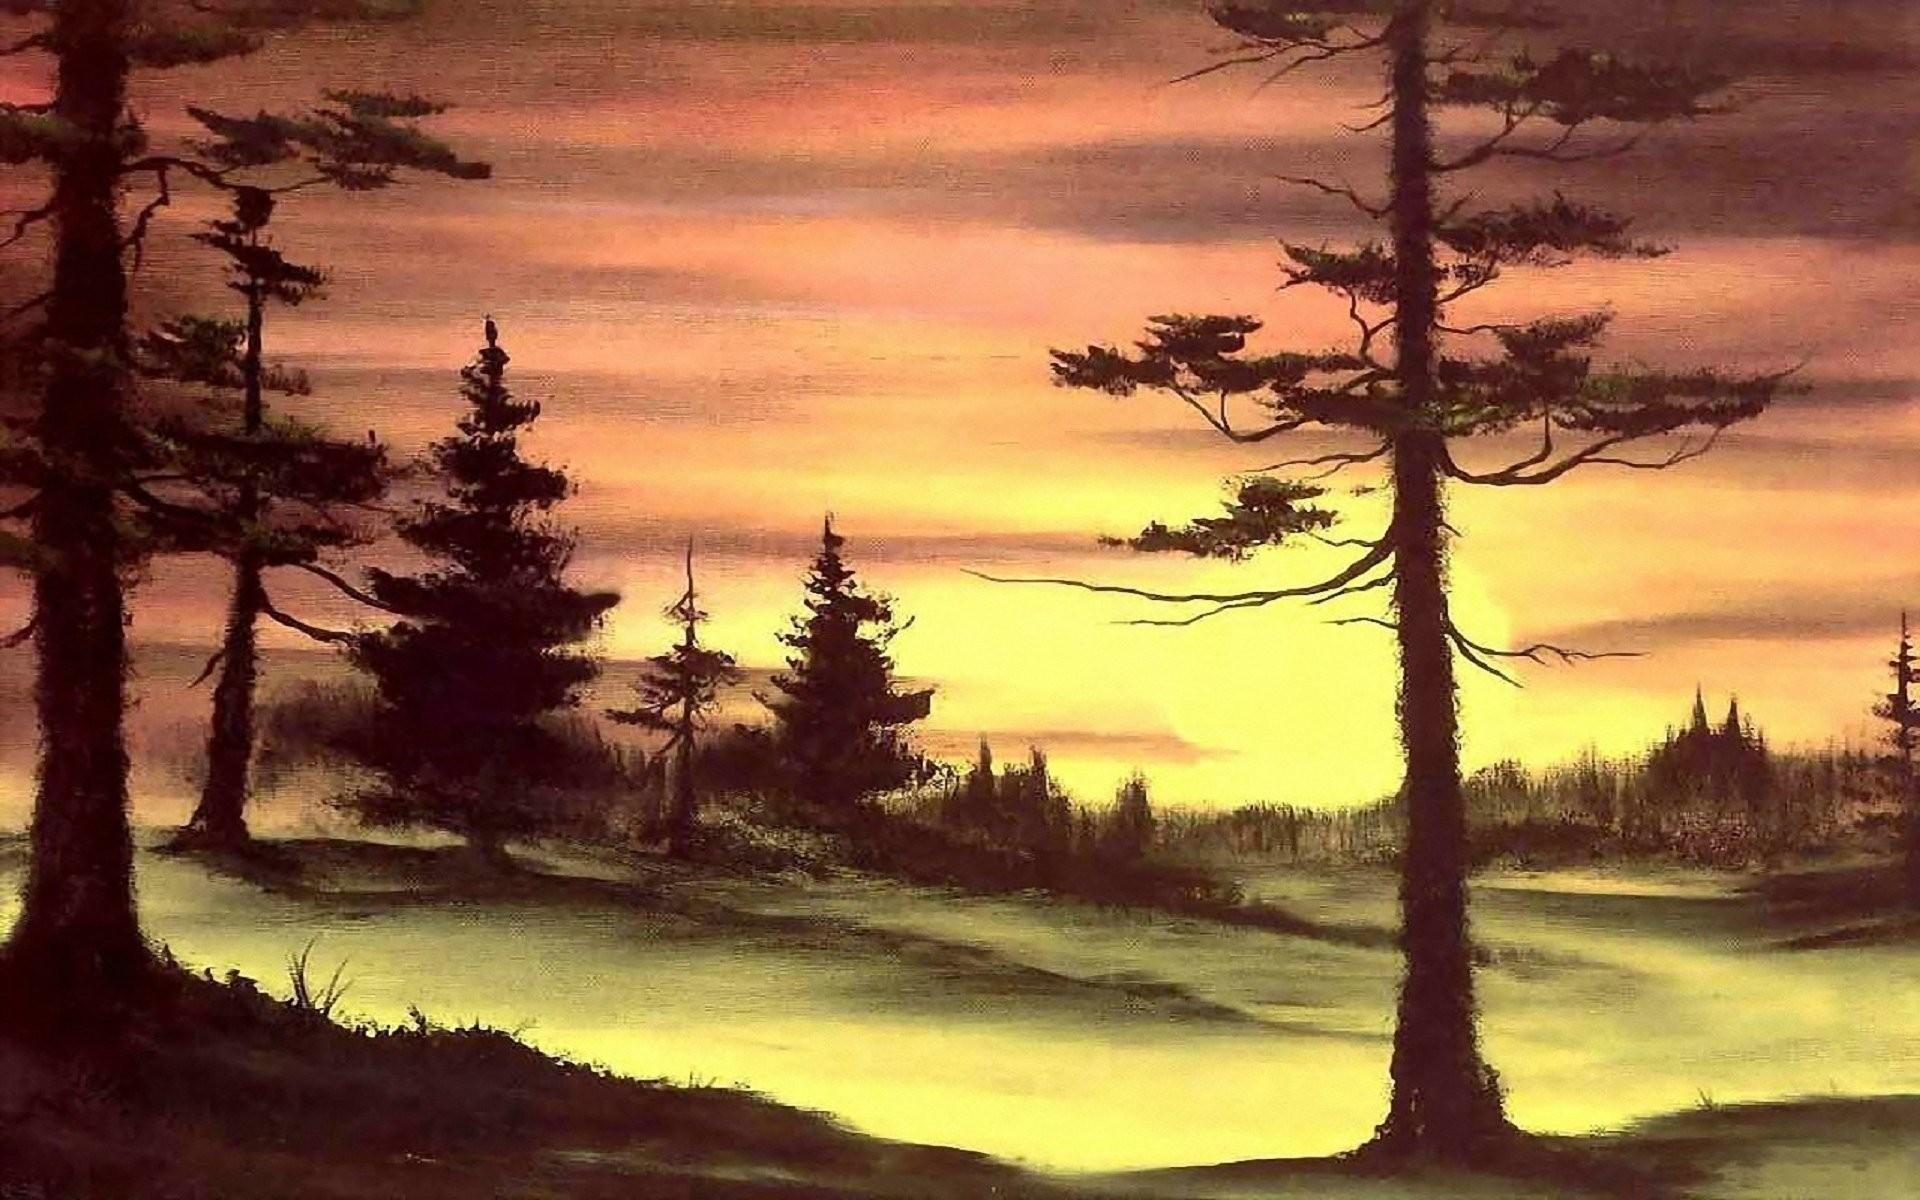 painting bob ross bob ross pattern nature sunset sun forest tree